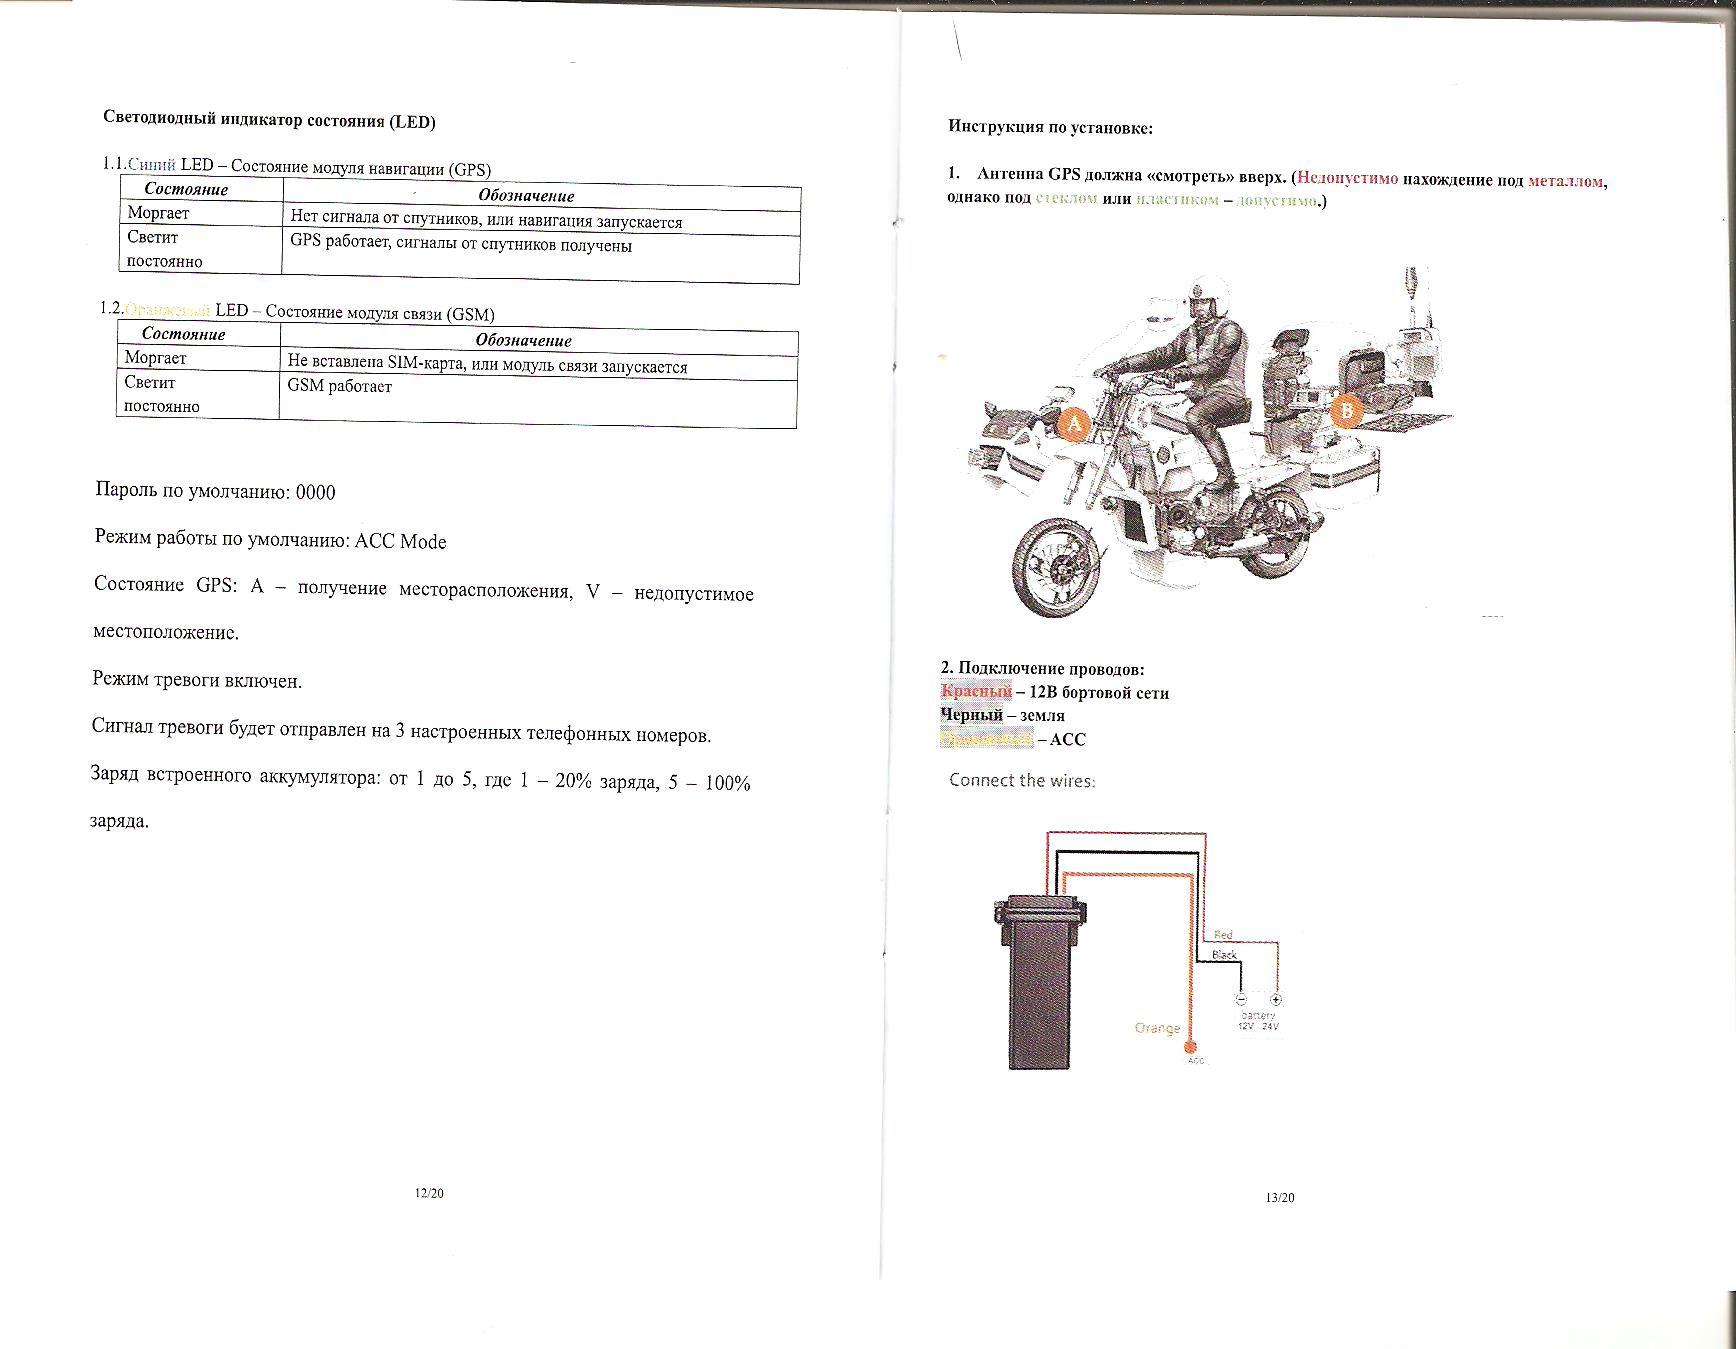 GPS трекер ST-901 (MT-1) — Nissan Almera Classic, 1 6 л